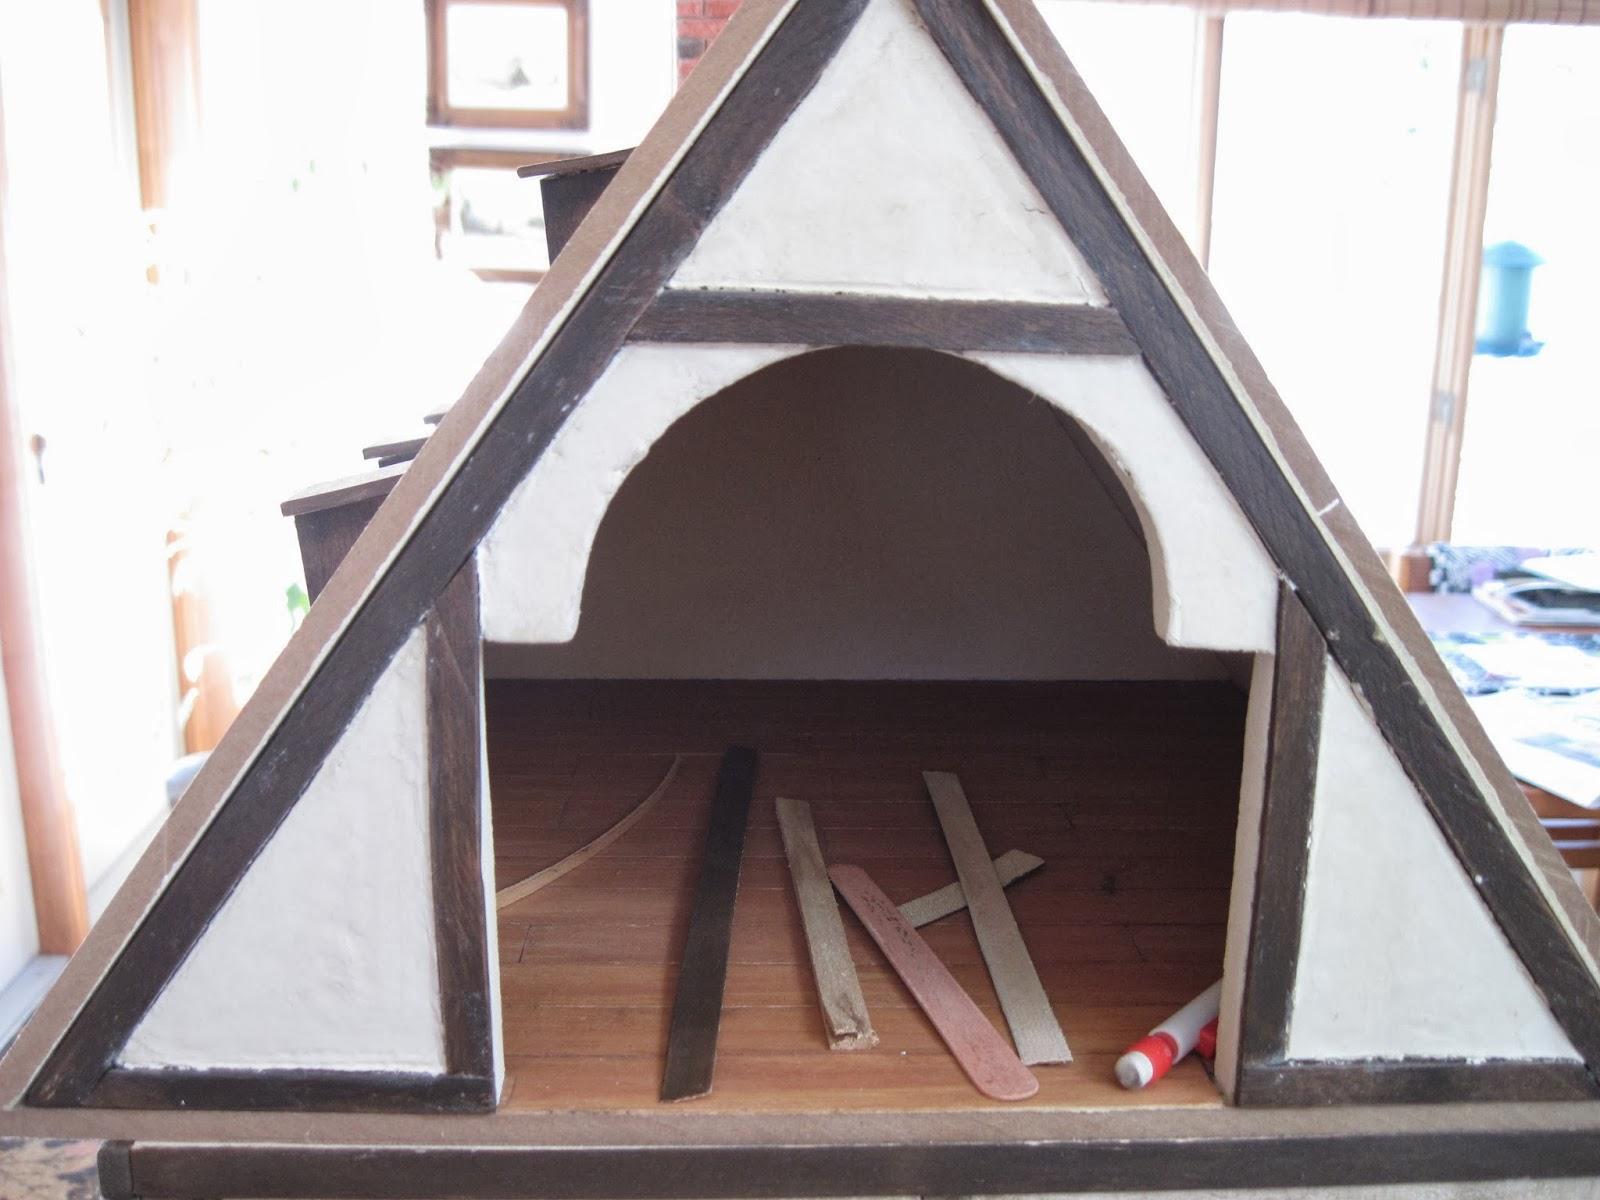 pulchinella's cellar miniatures: How to Make Miniature Slate